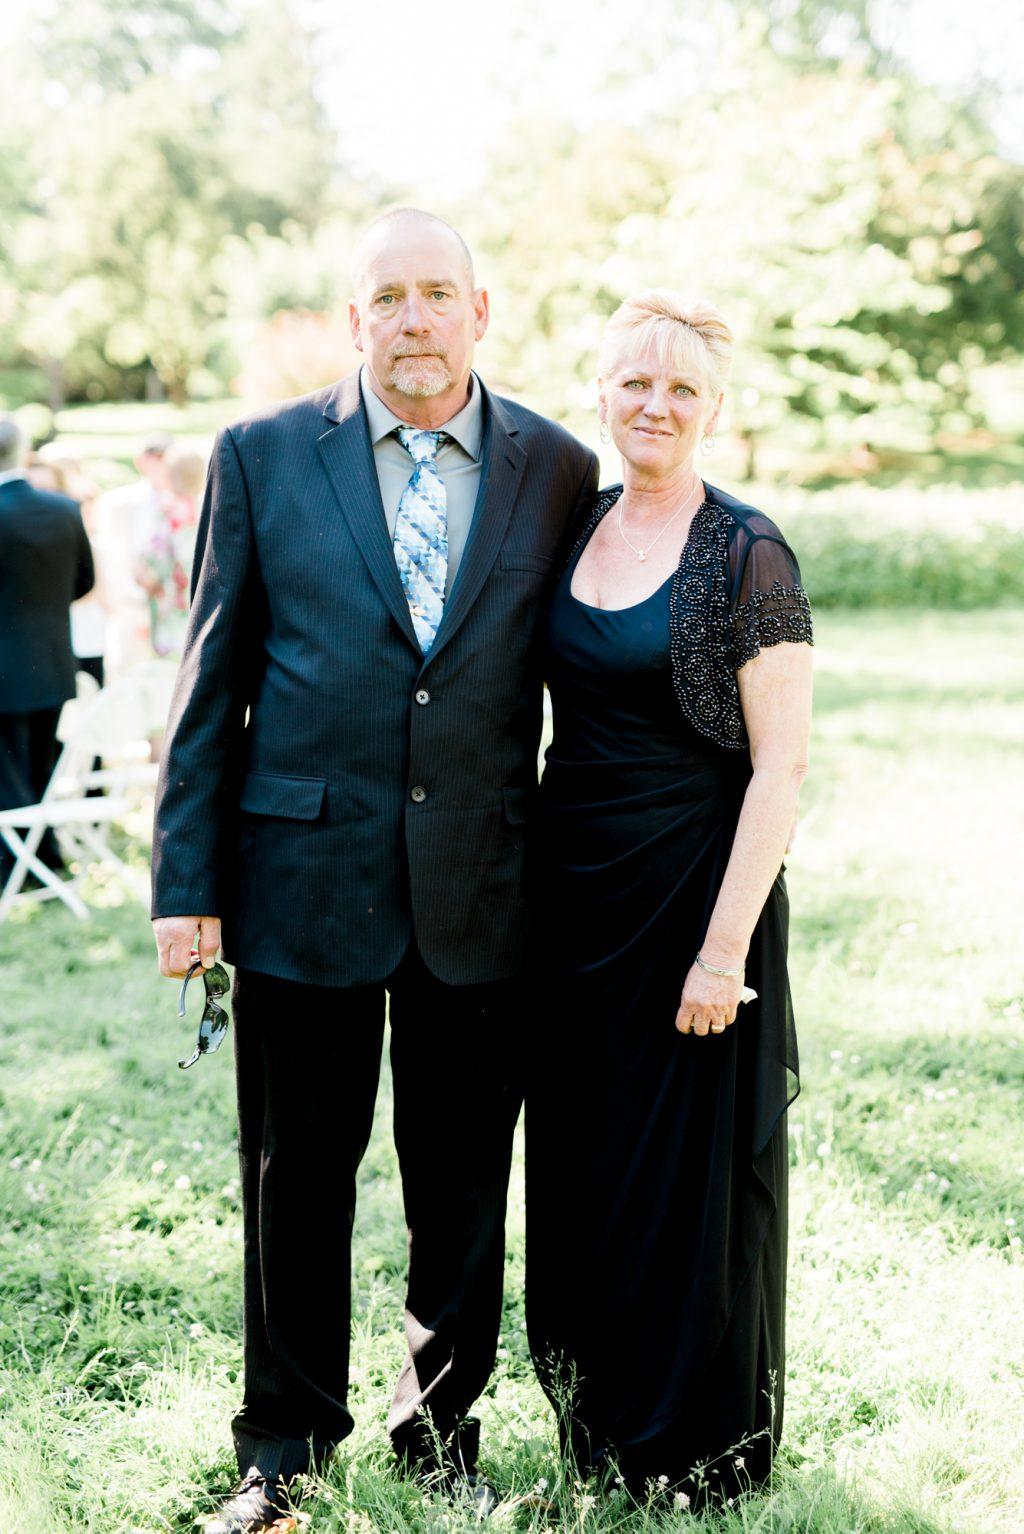 haley-richter-photo-west-chester-summer-wedding-boxcar-brewery-132